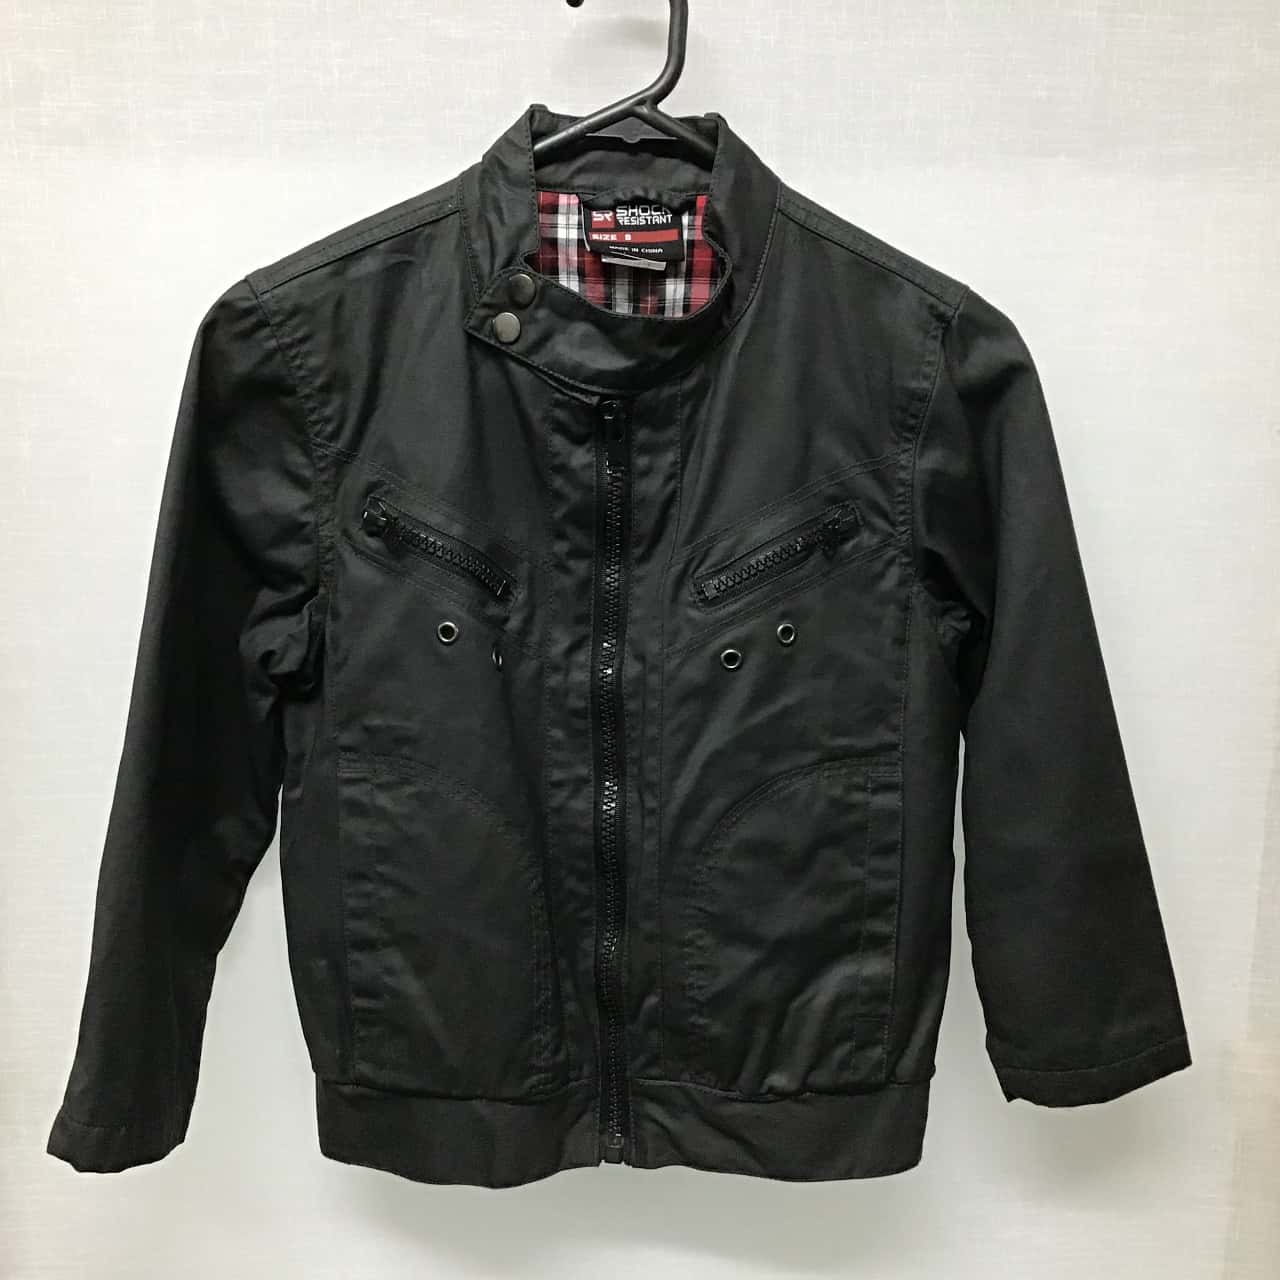 Shock Resistant, Boy's black jacket, Size 8